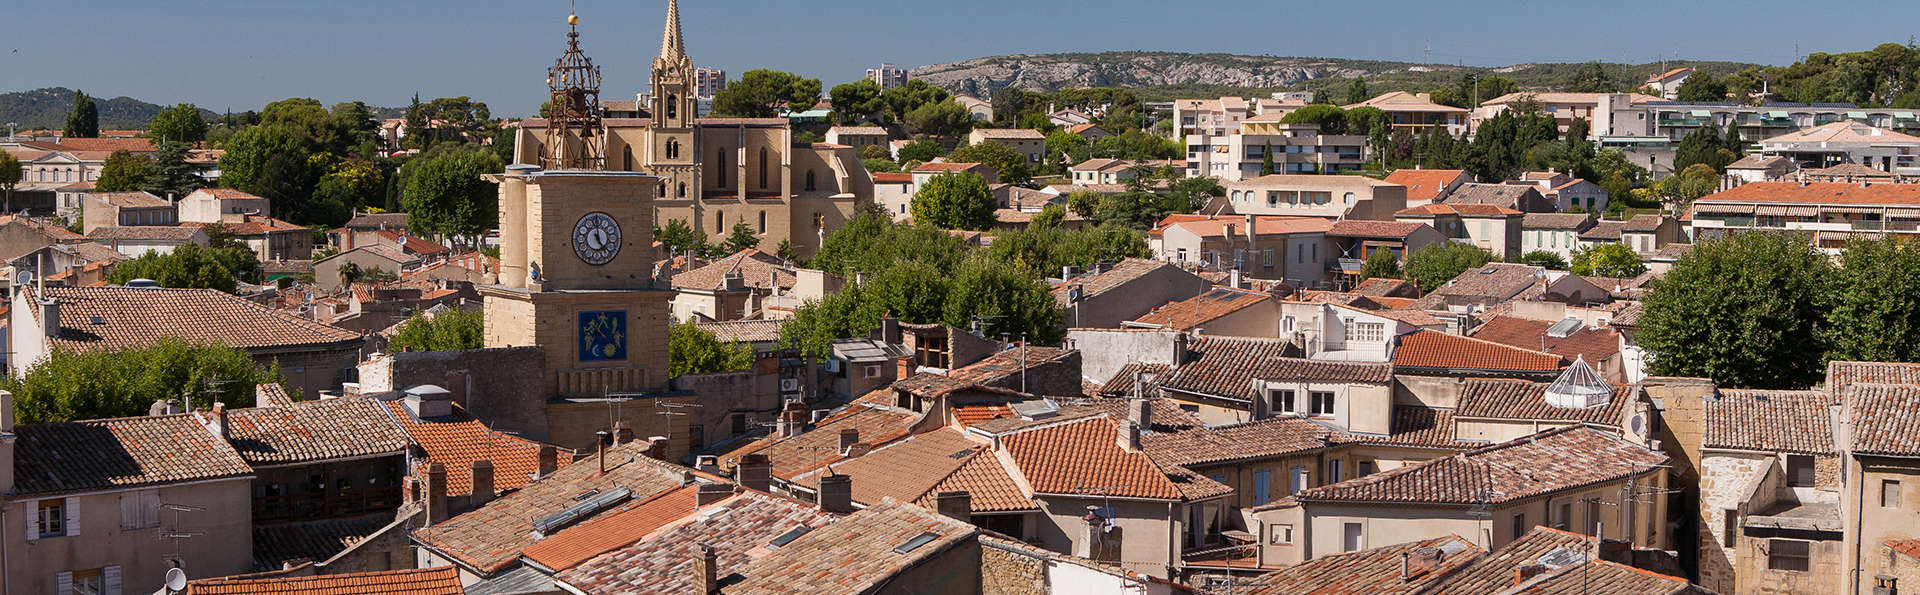 Hotel Ibis Salon de Provence Sud - Edit_SalondeProvence2.jpg